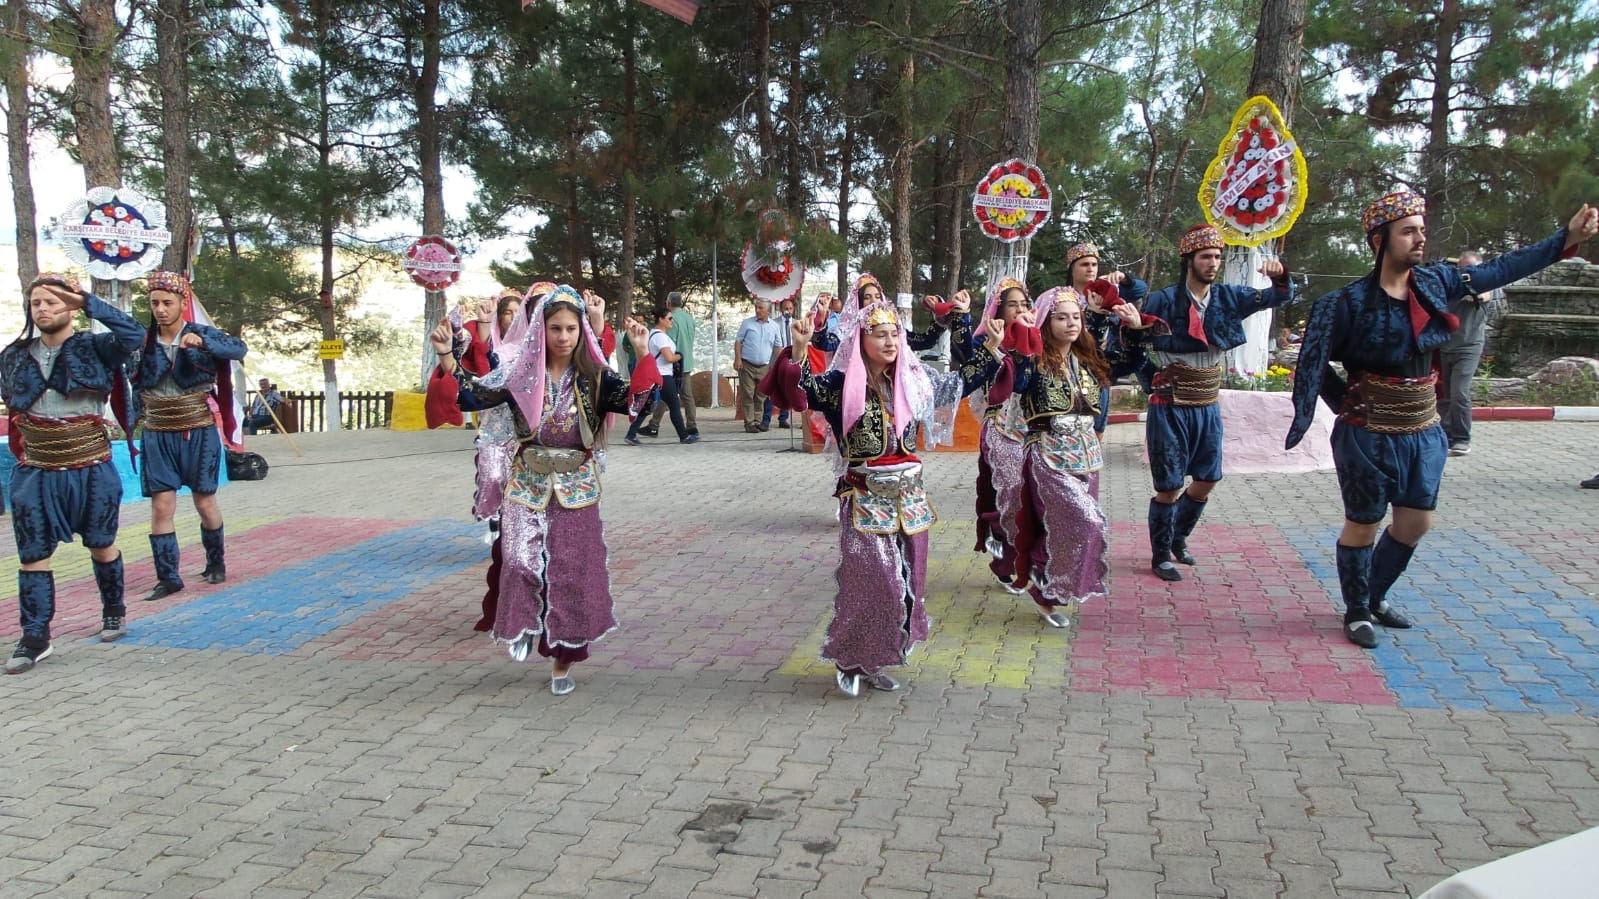 13. Ulubey Kanyon Kültür ve Turizm Festivali